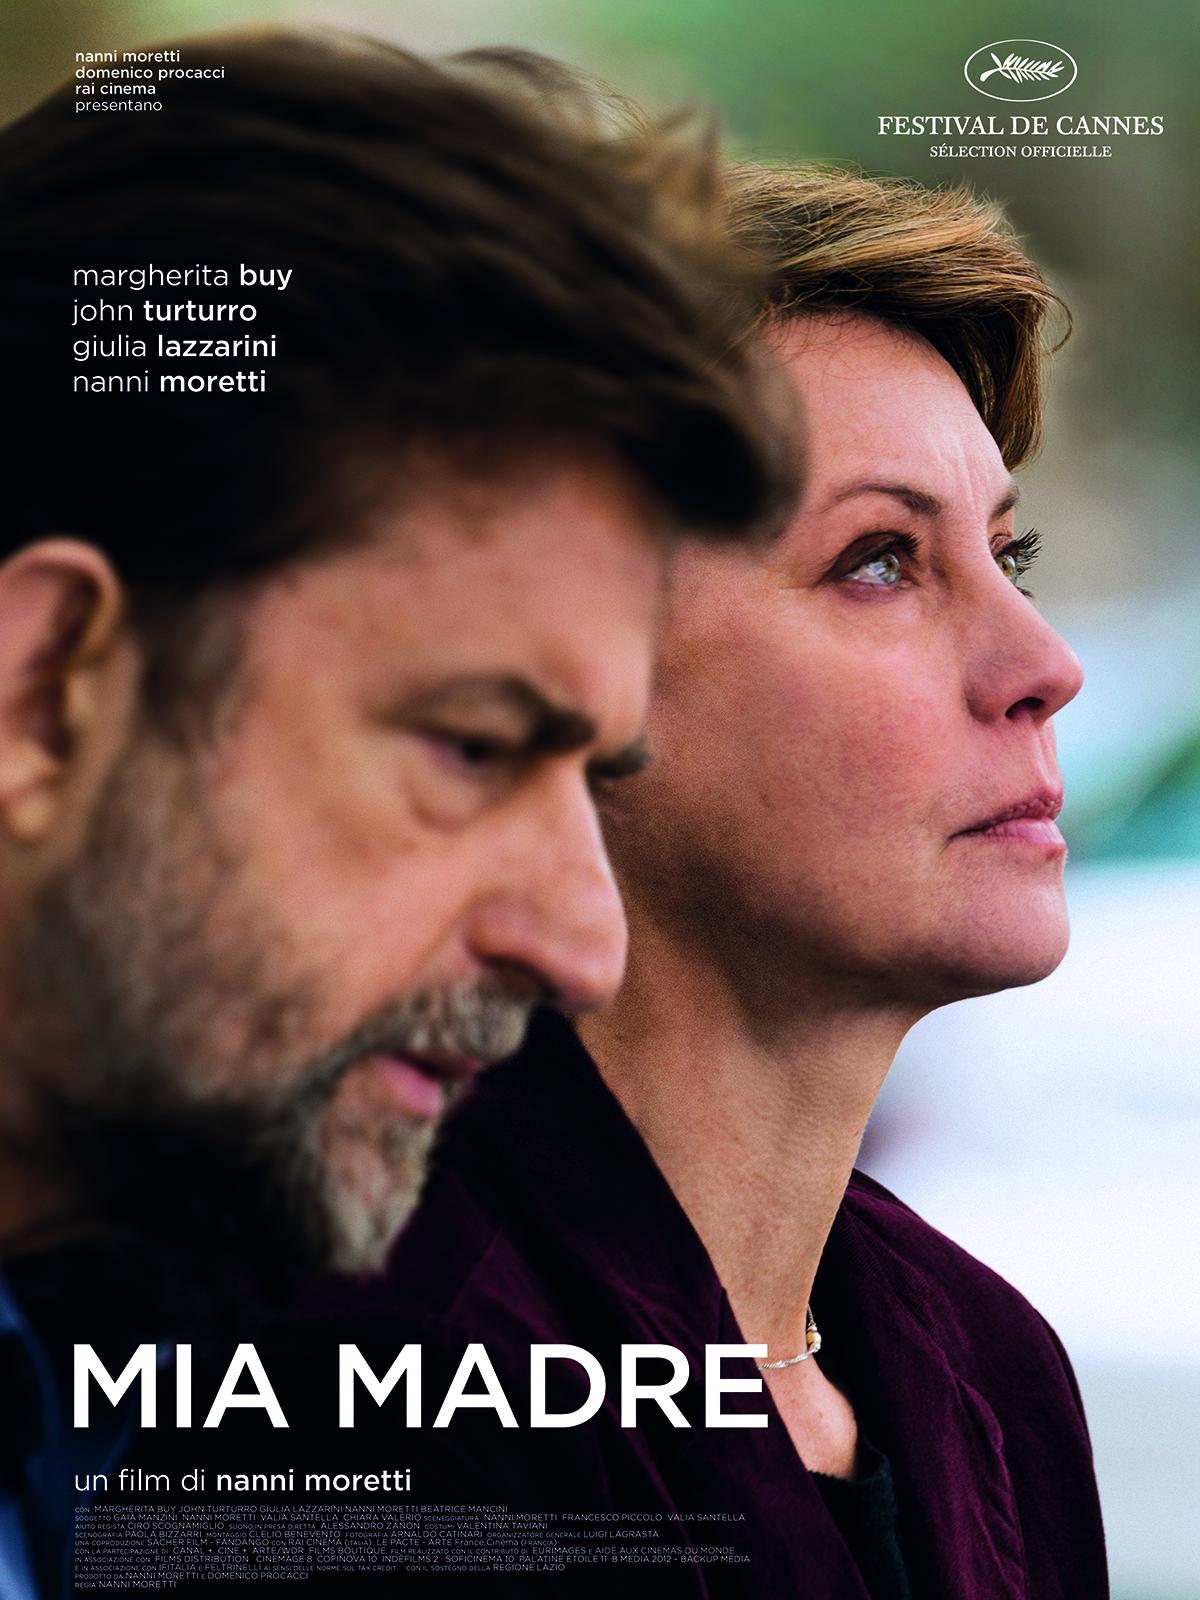 Mia Madre | Moretti, Nanni (Réalisateur)